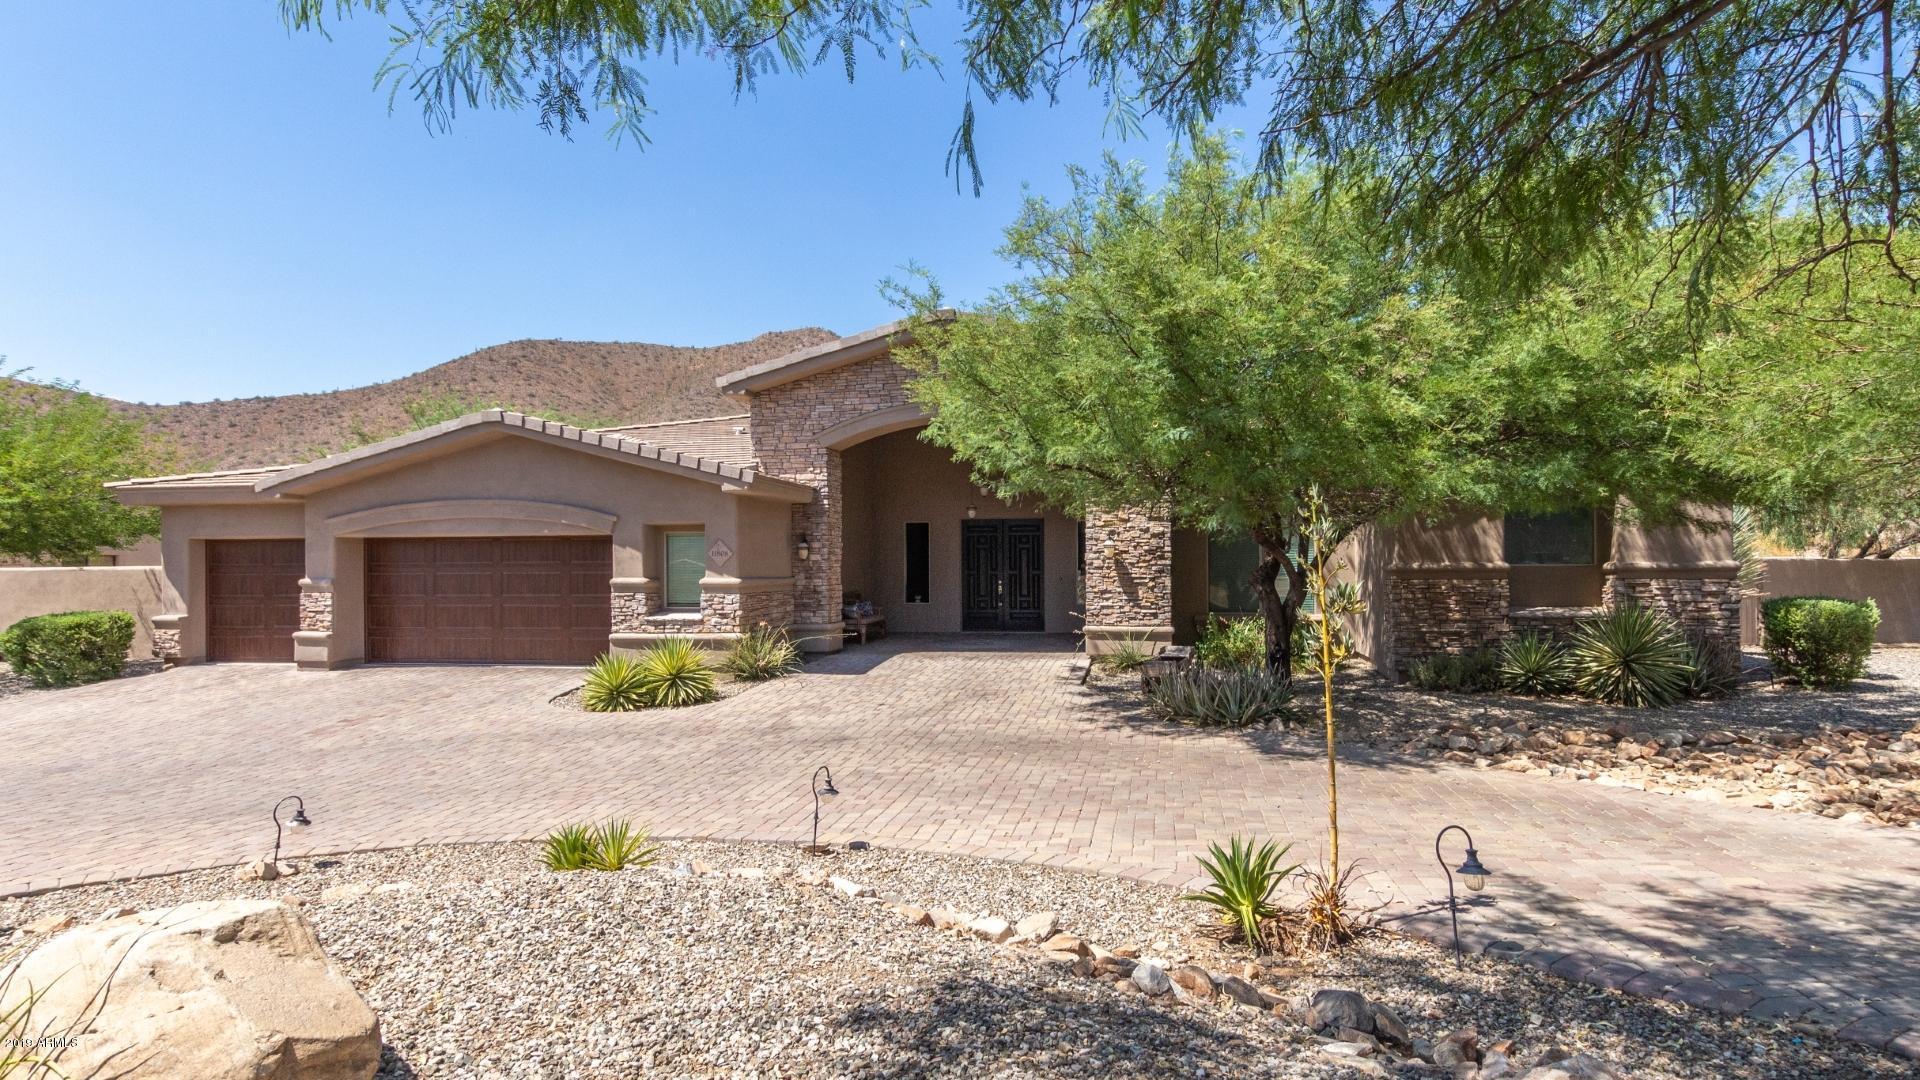 Photo of 11808 E LARKSPUR Drive, Scottsdale, AZ 85259